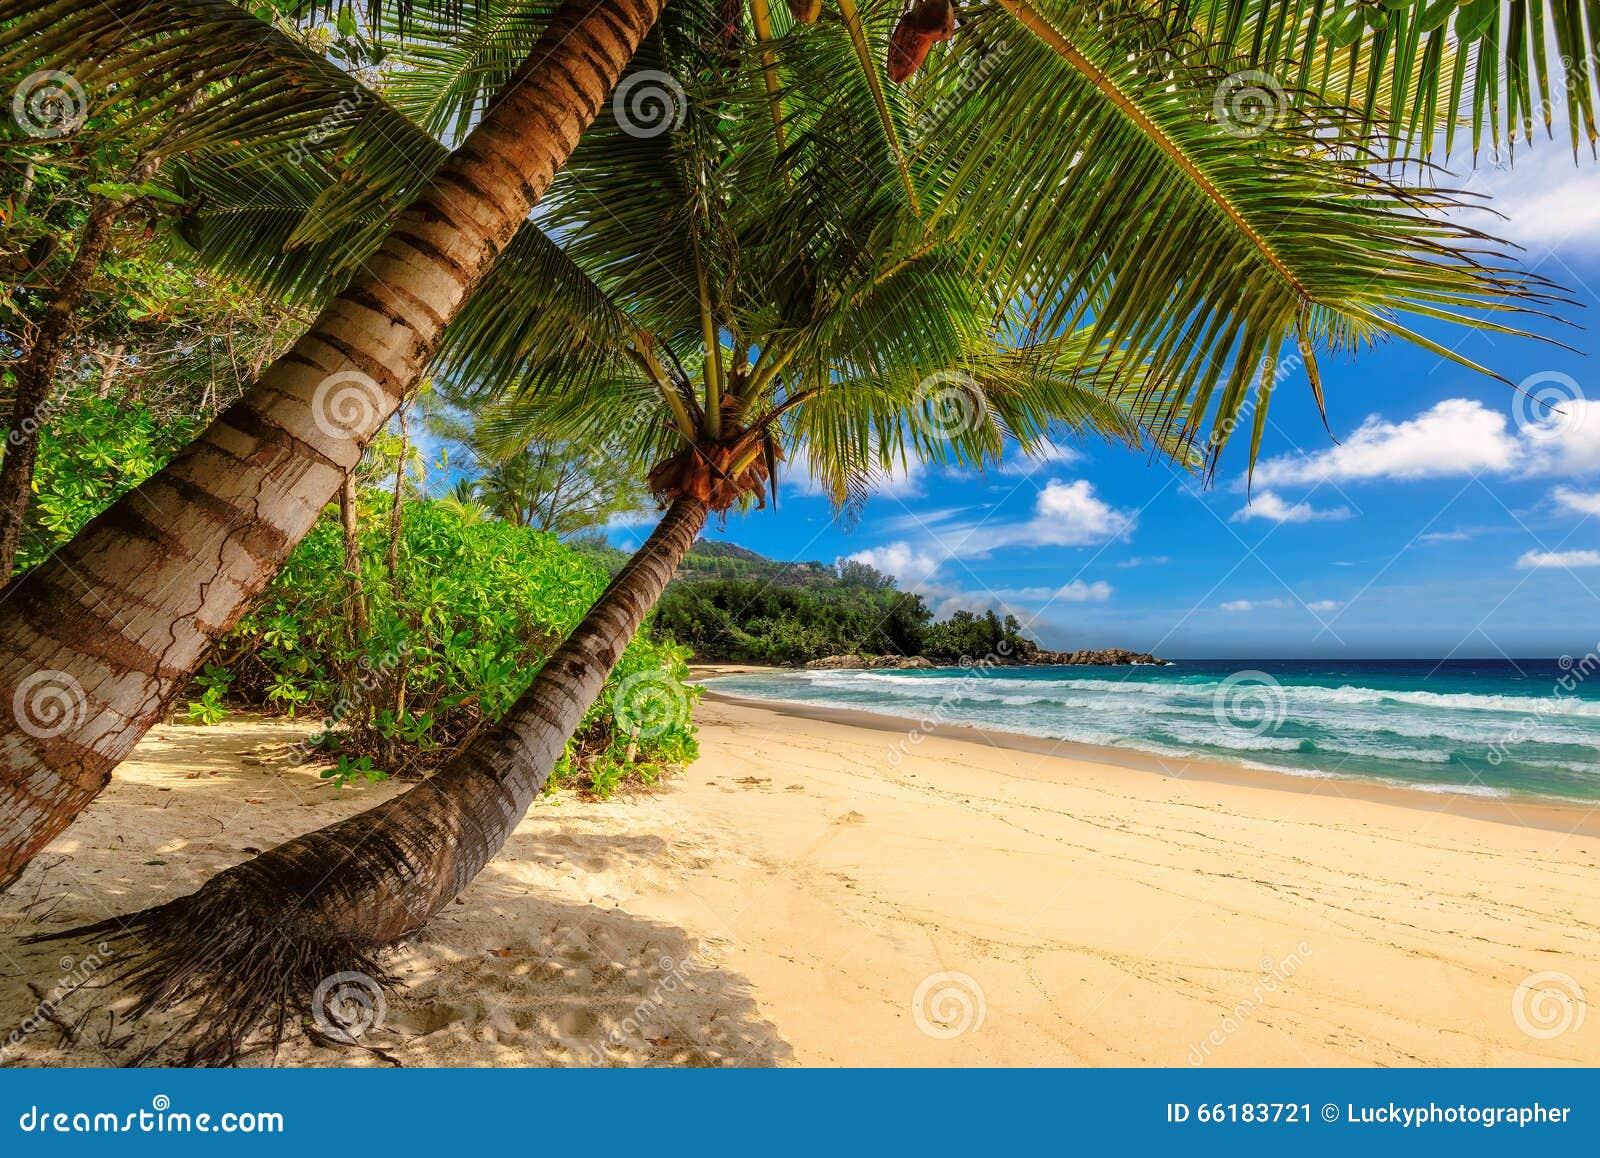 Тропические ладони приставают к берегу в ямайке на карибском море